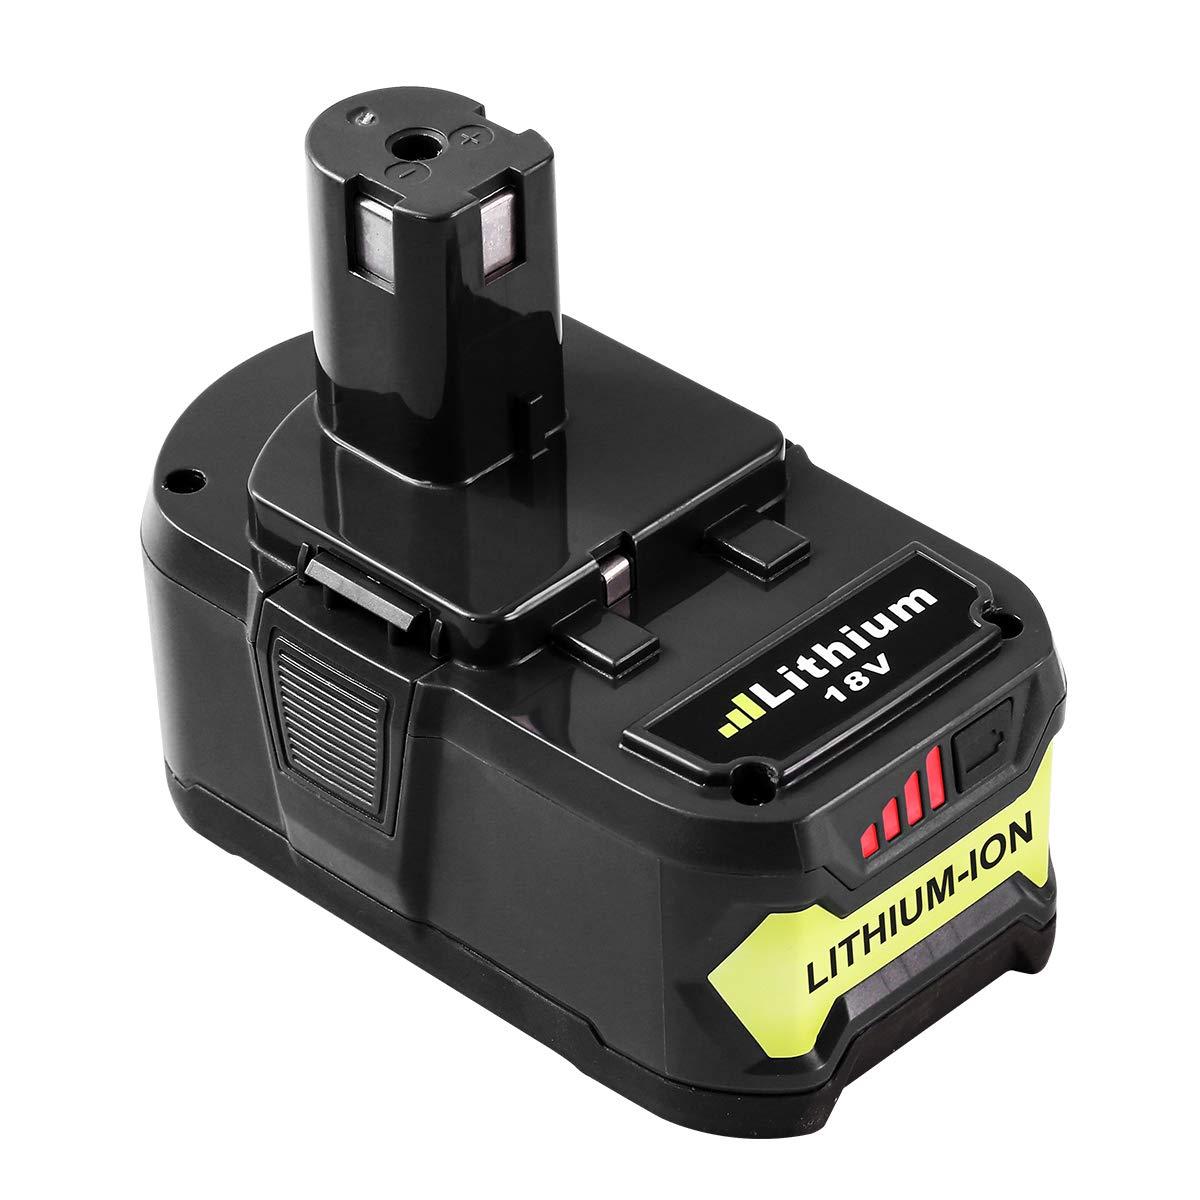 6.0AH for Ryobi 18v Battery Replace Ryobi One Plus Lithium Battery P100 P102 P104 P105 P108 P107